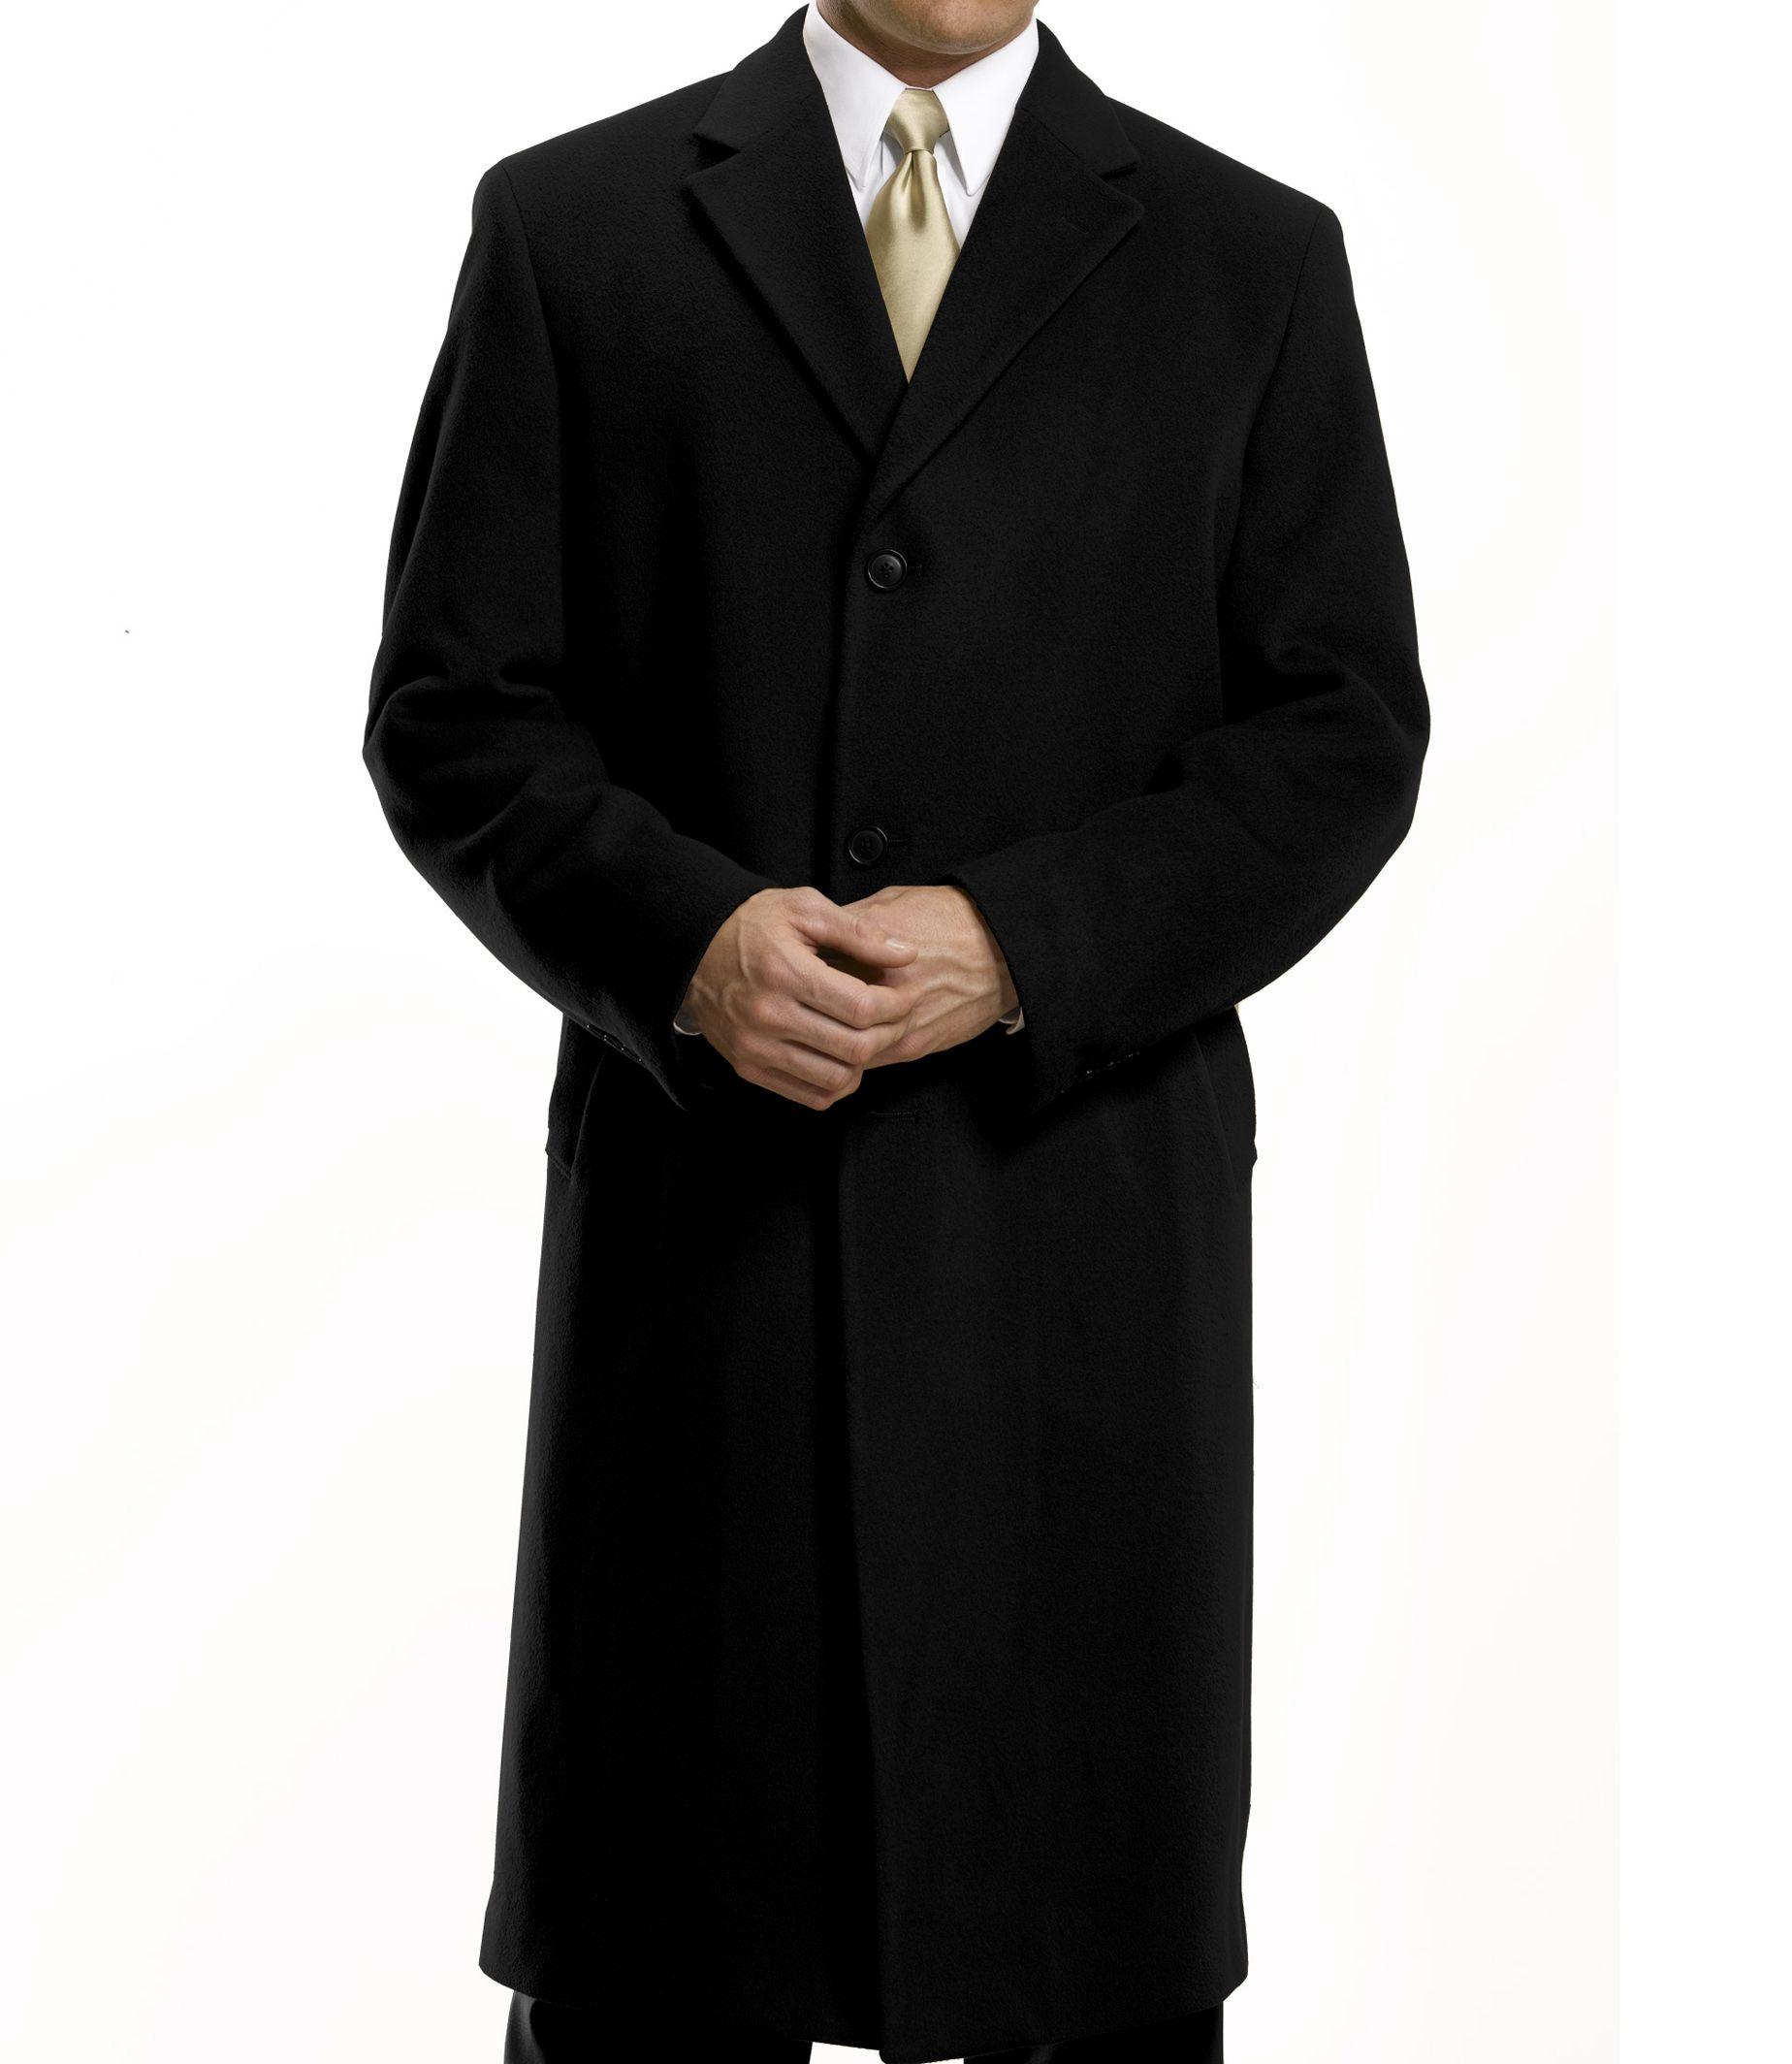 Executive Full Length Merino Wool Topcoat CLEARANCE - All